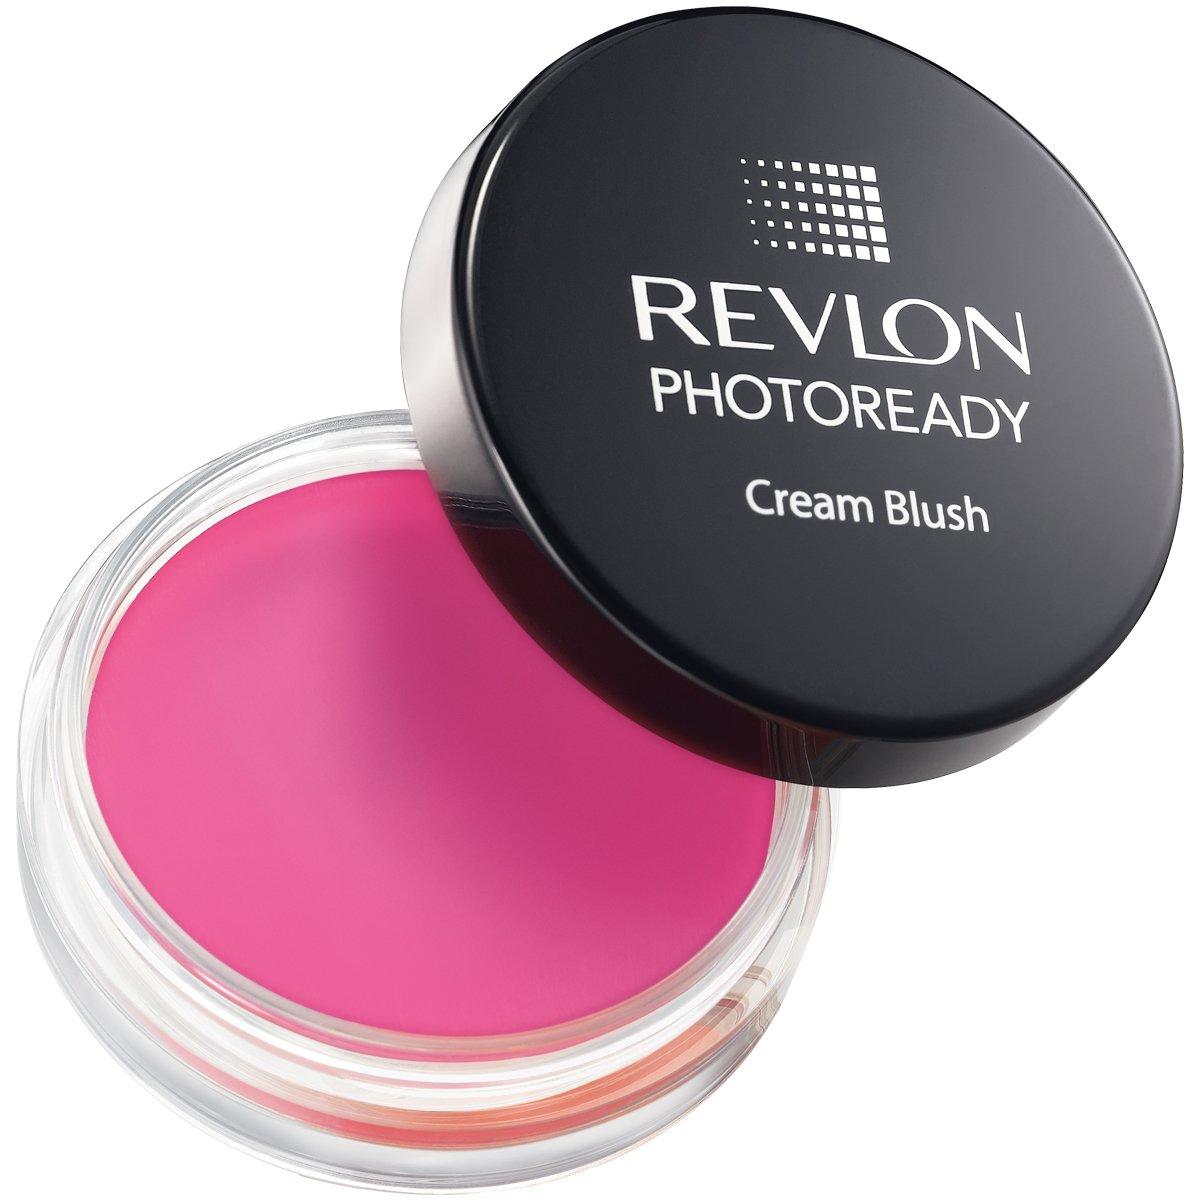 Revlon Photo Ready Cream Blush, 125 Tickled